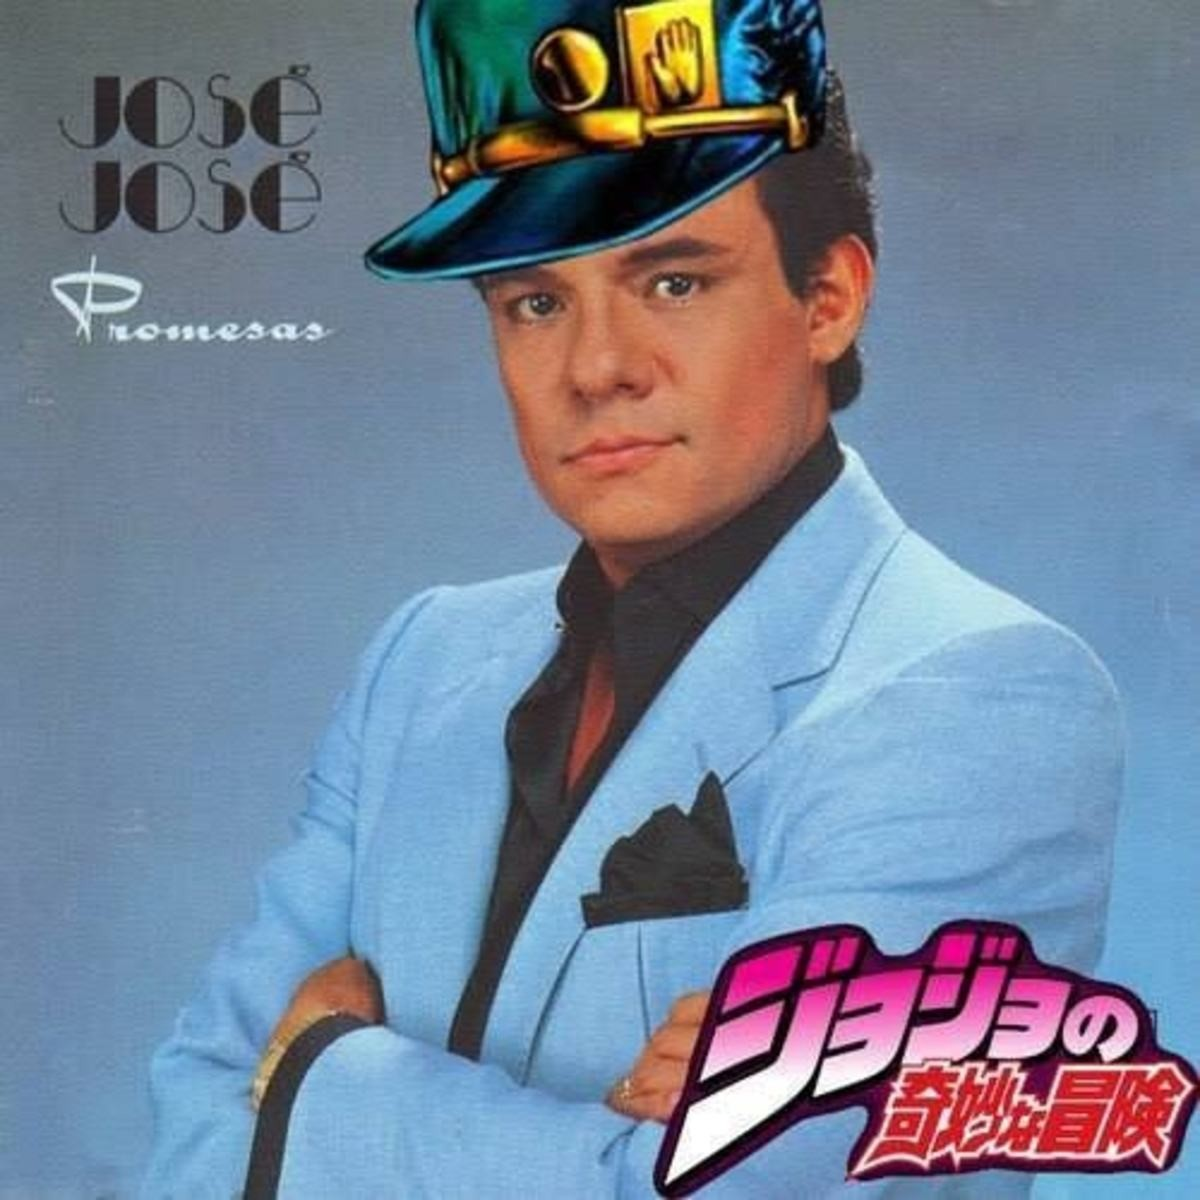 The King without Crown. Context: Mexican singer José José died last month..